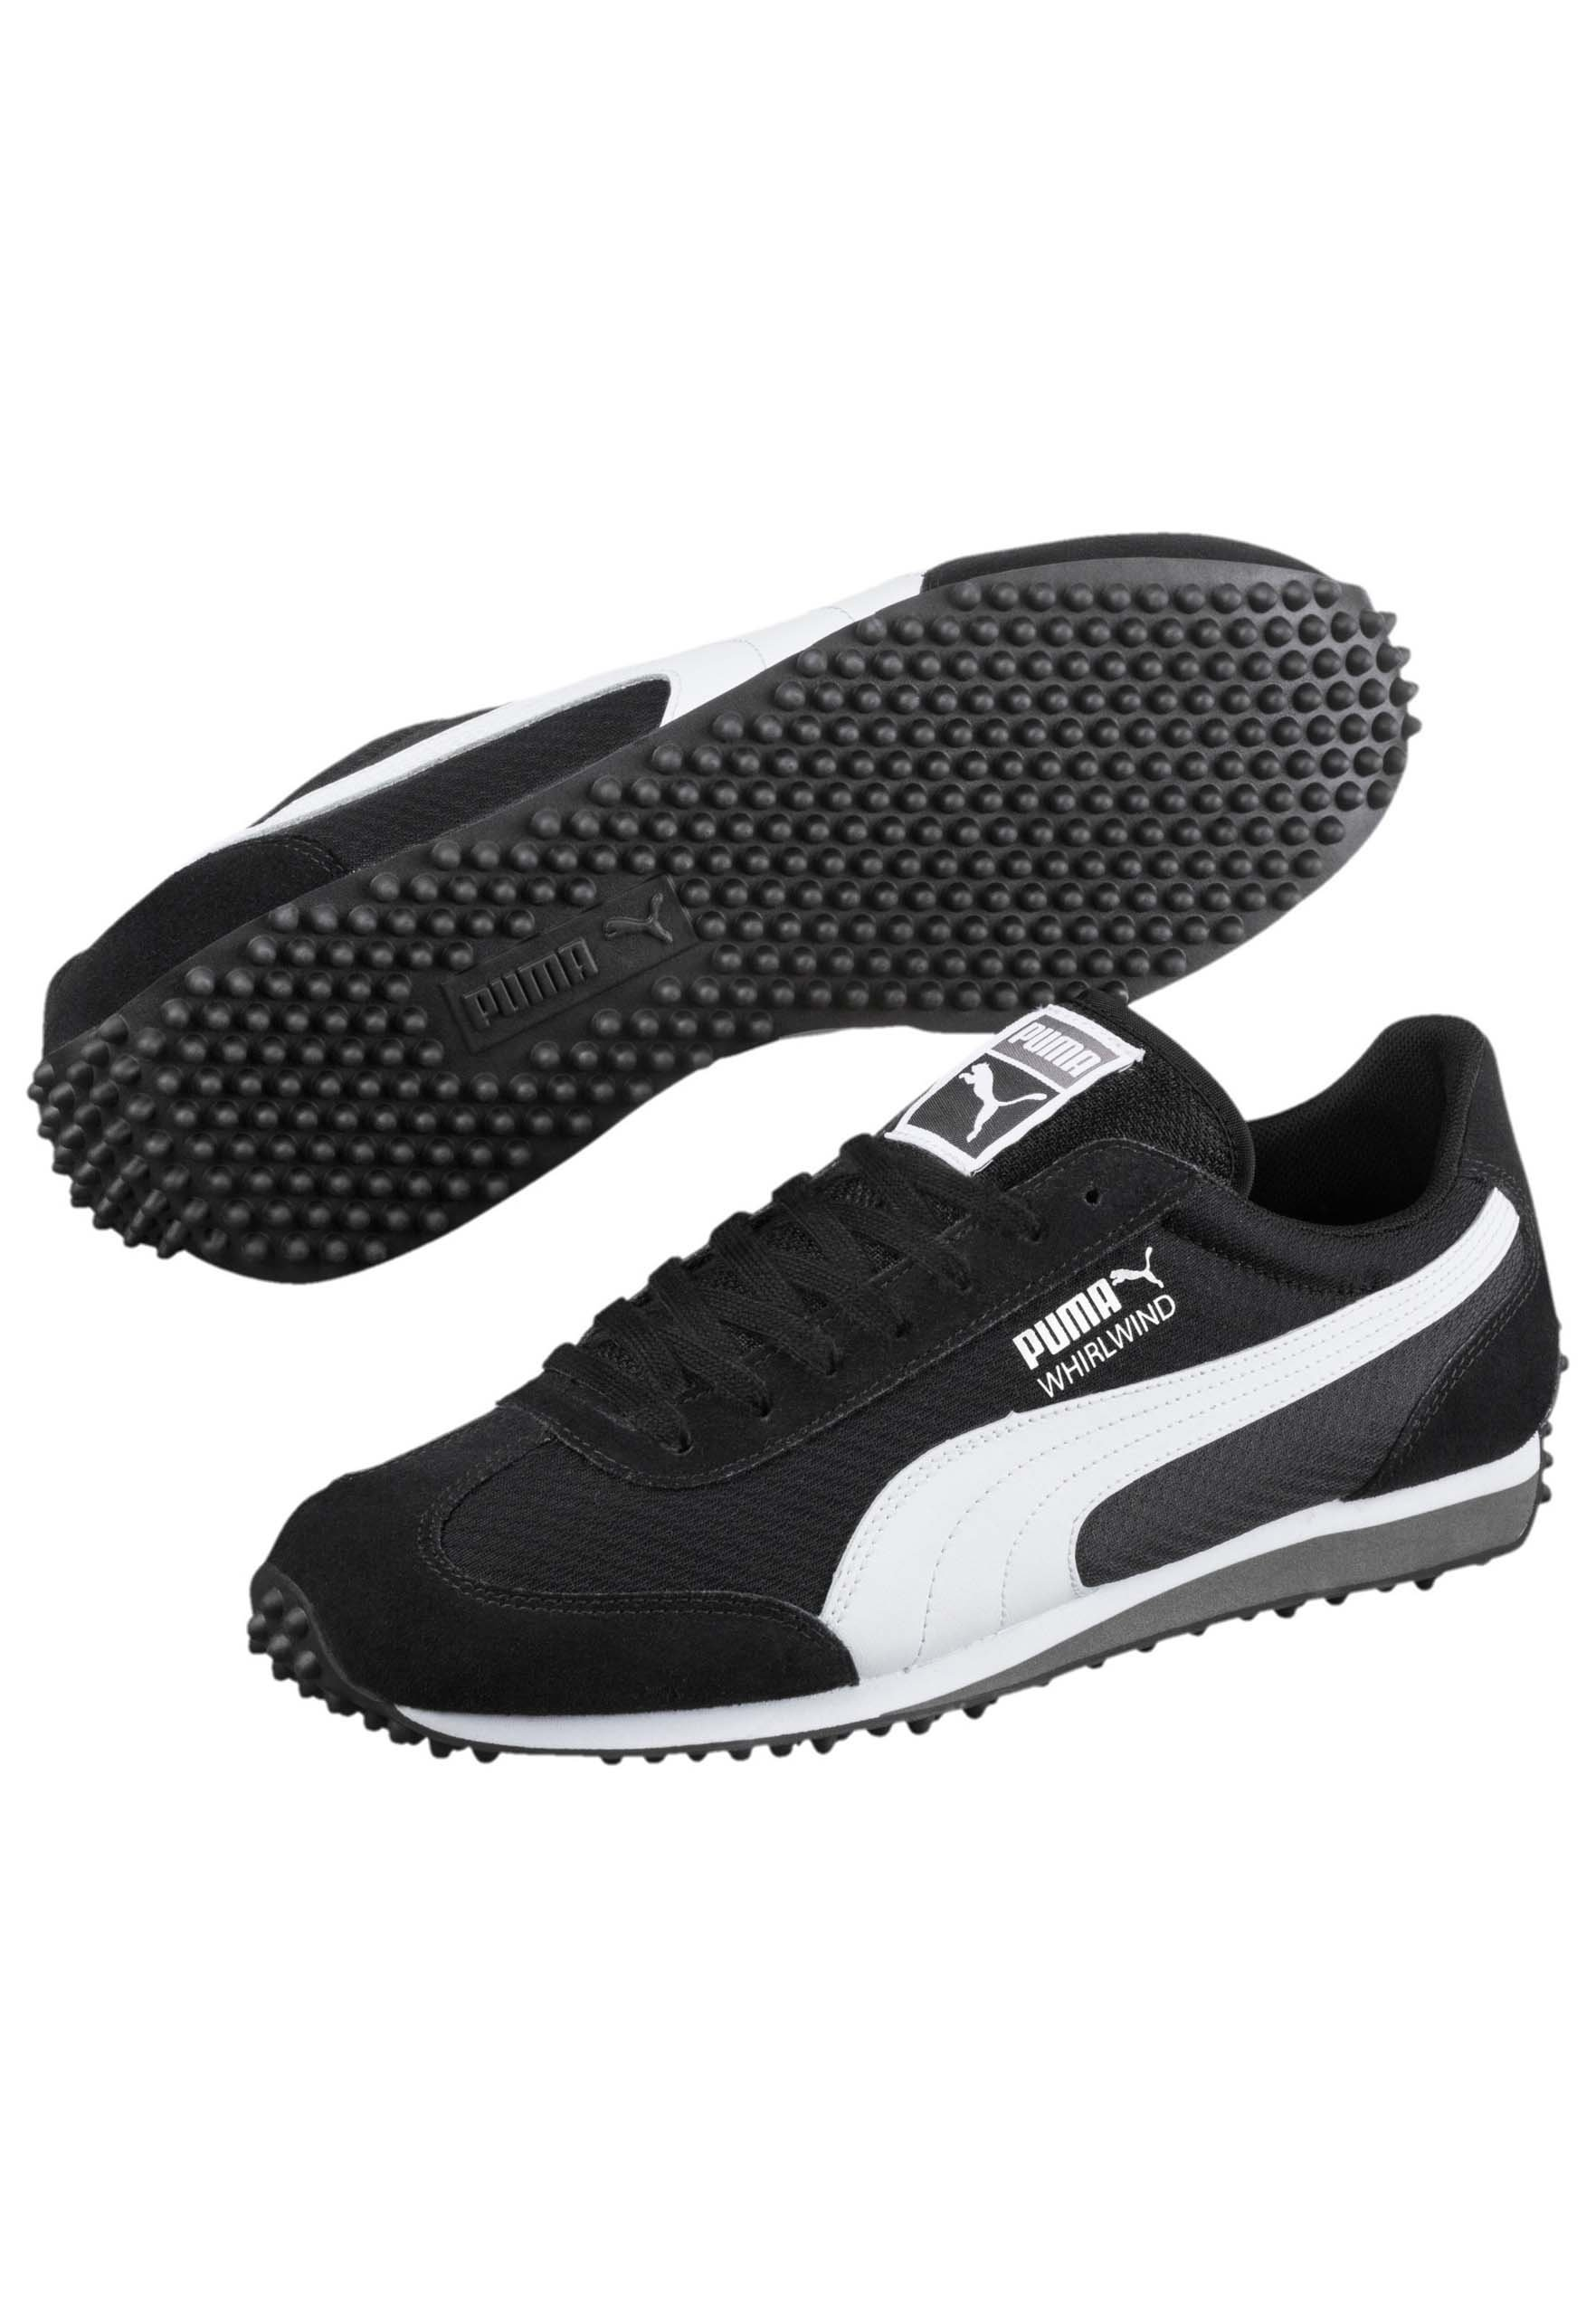 Puma WHIRLWIND - Baskets basses - black- white-black-silver/noir ...